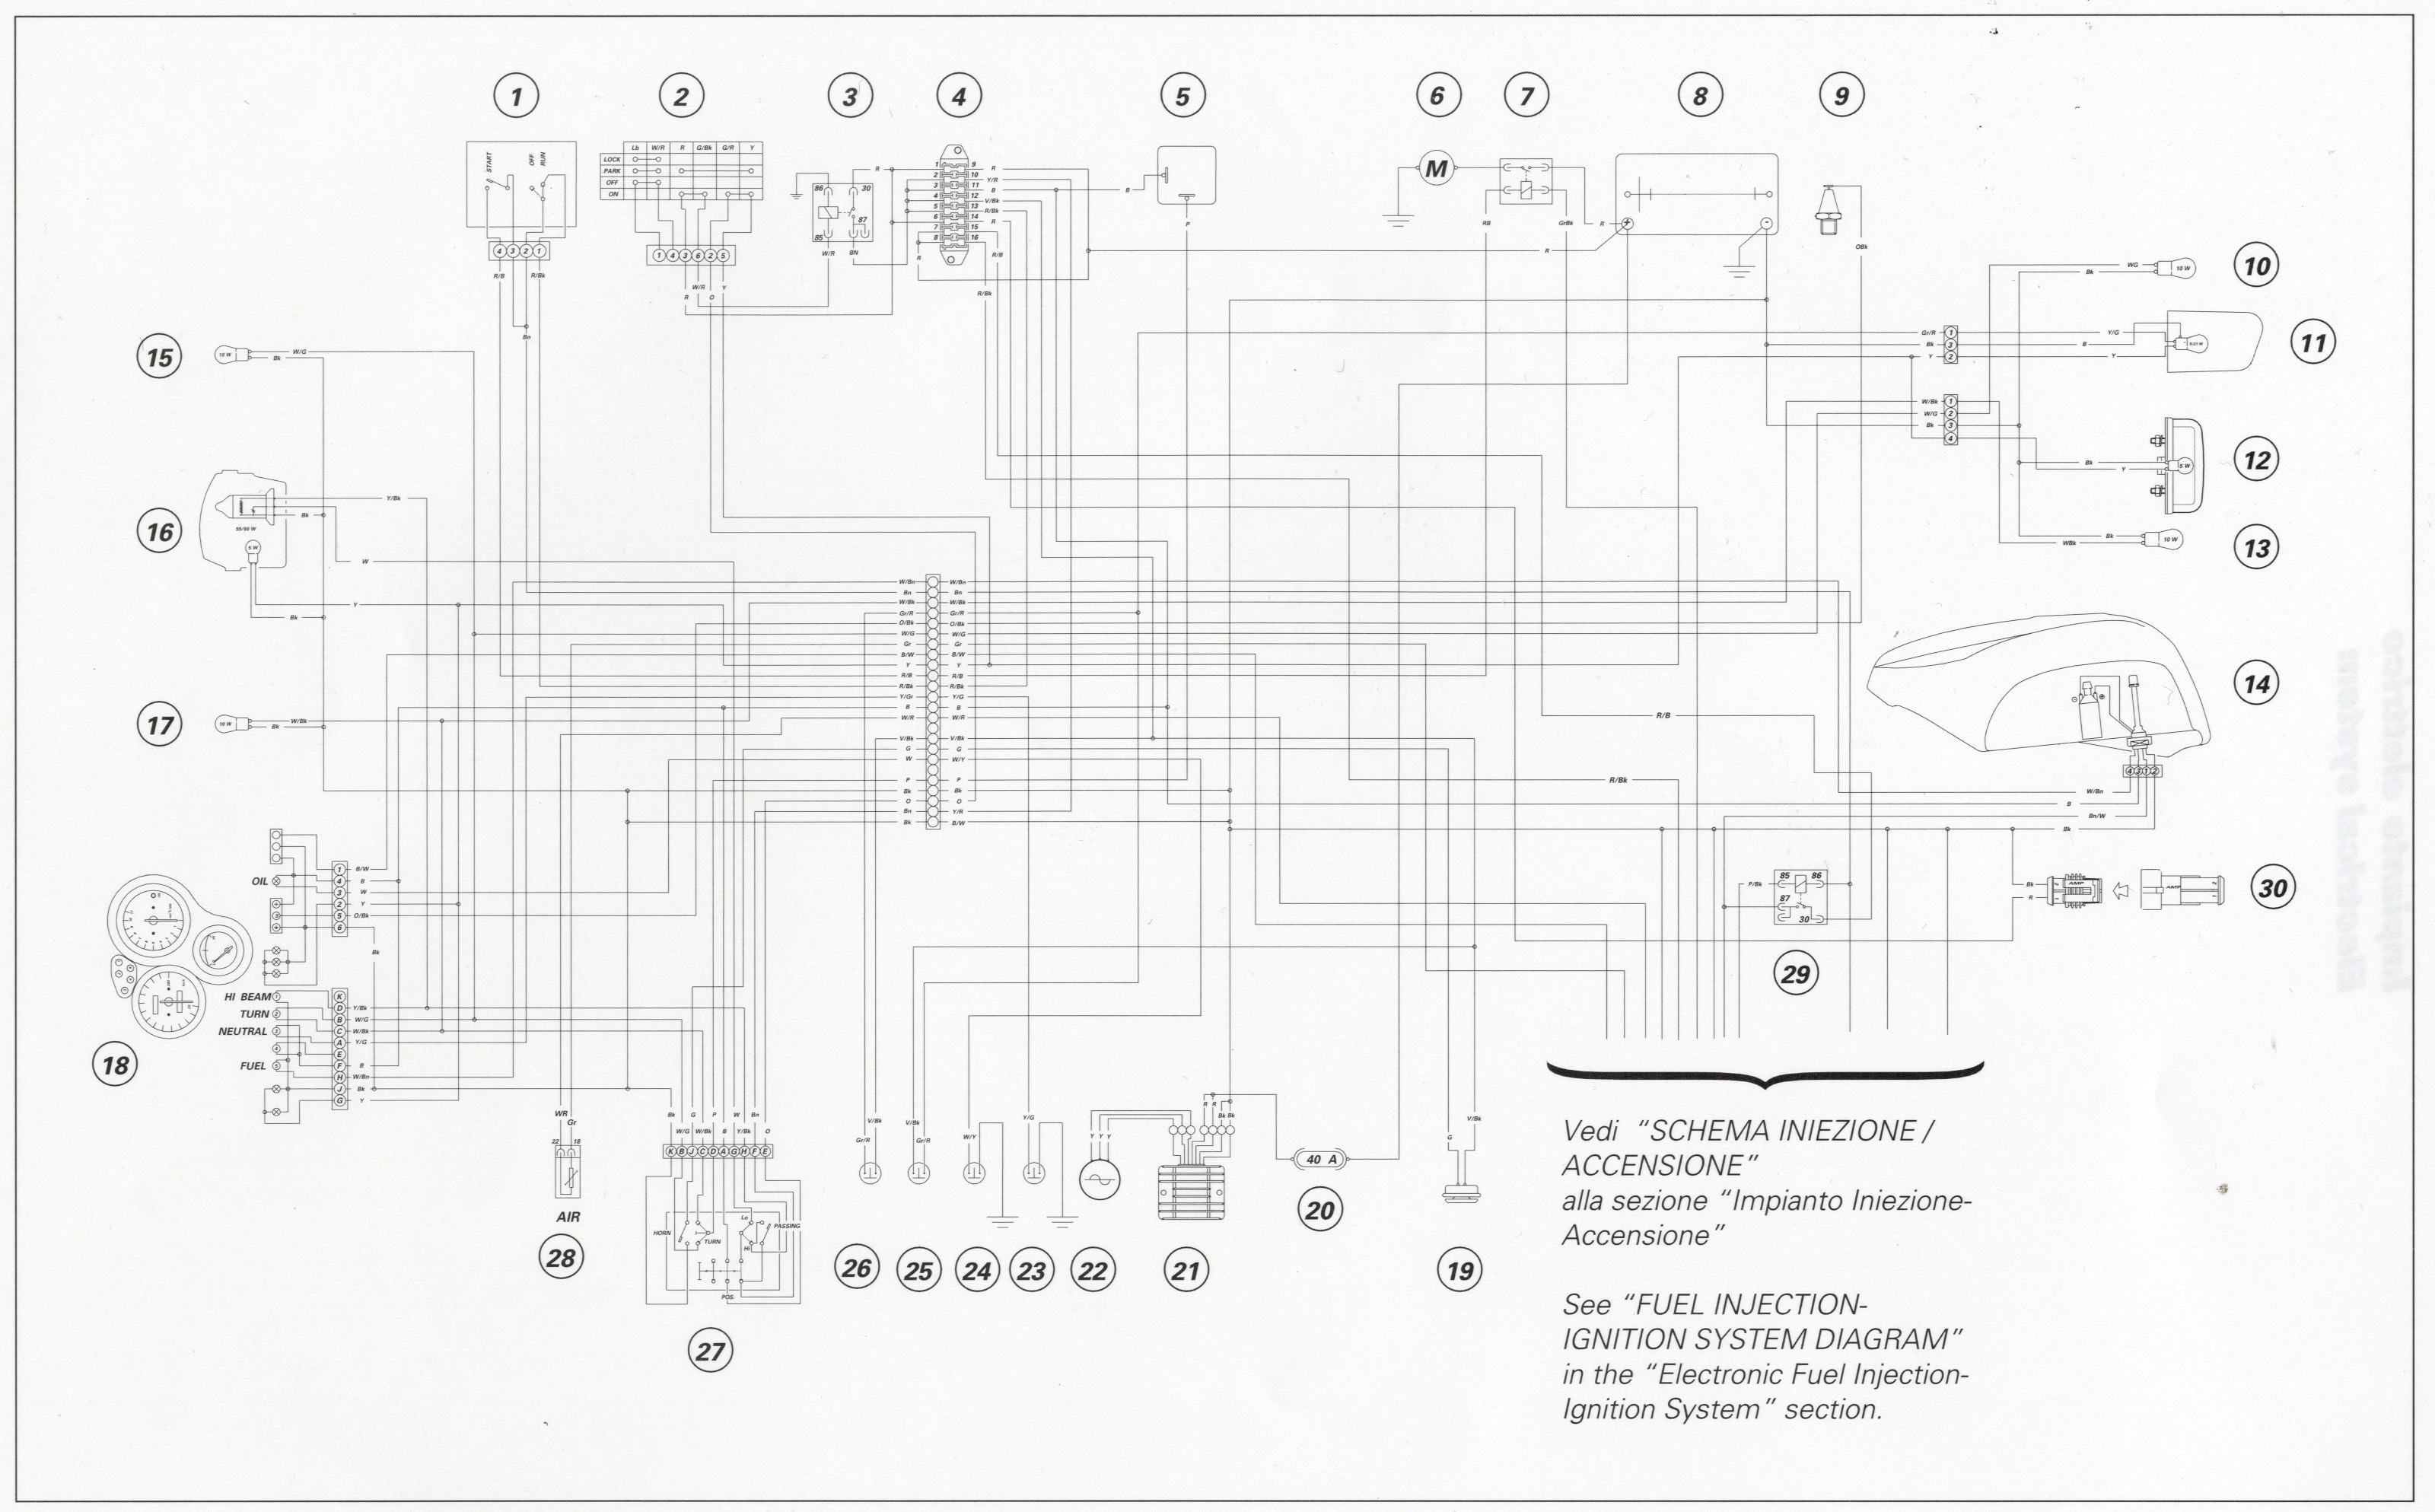 11 Pin Boss Plow Wiring Diagram Shop Manual Wiring Diagram Legend Wanted Ducati Ms